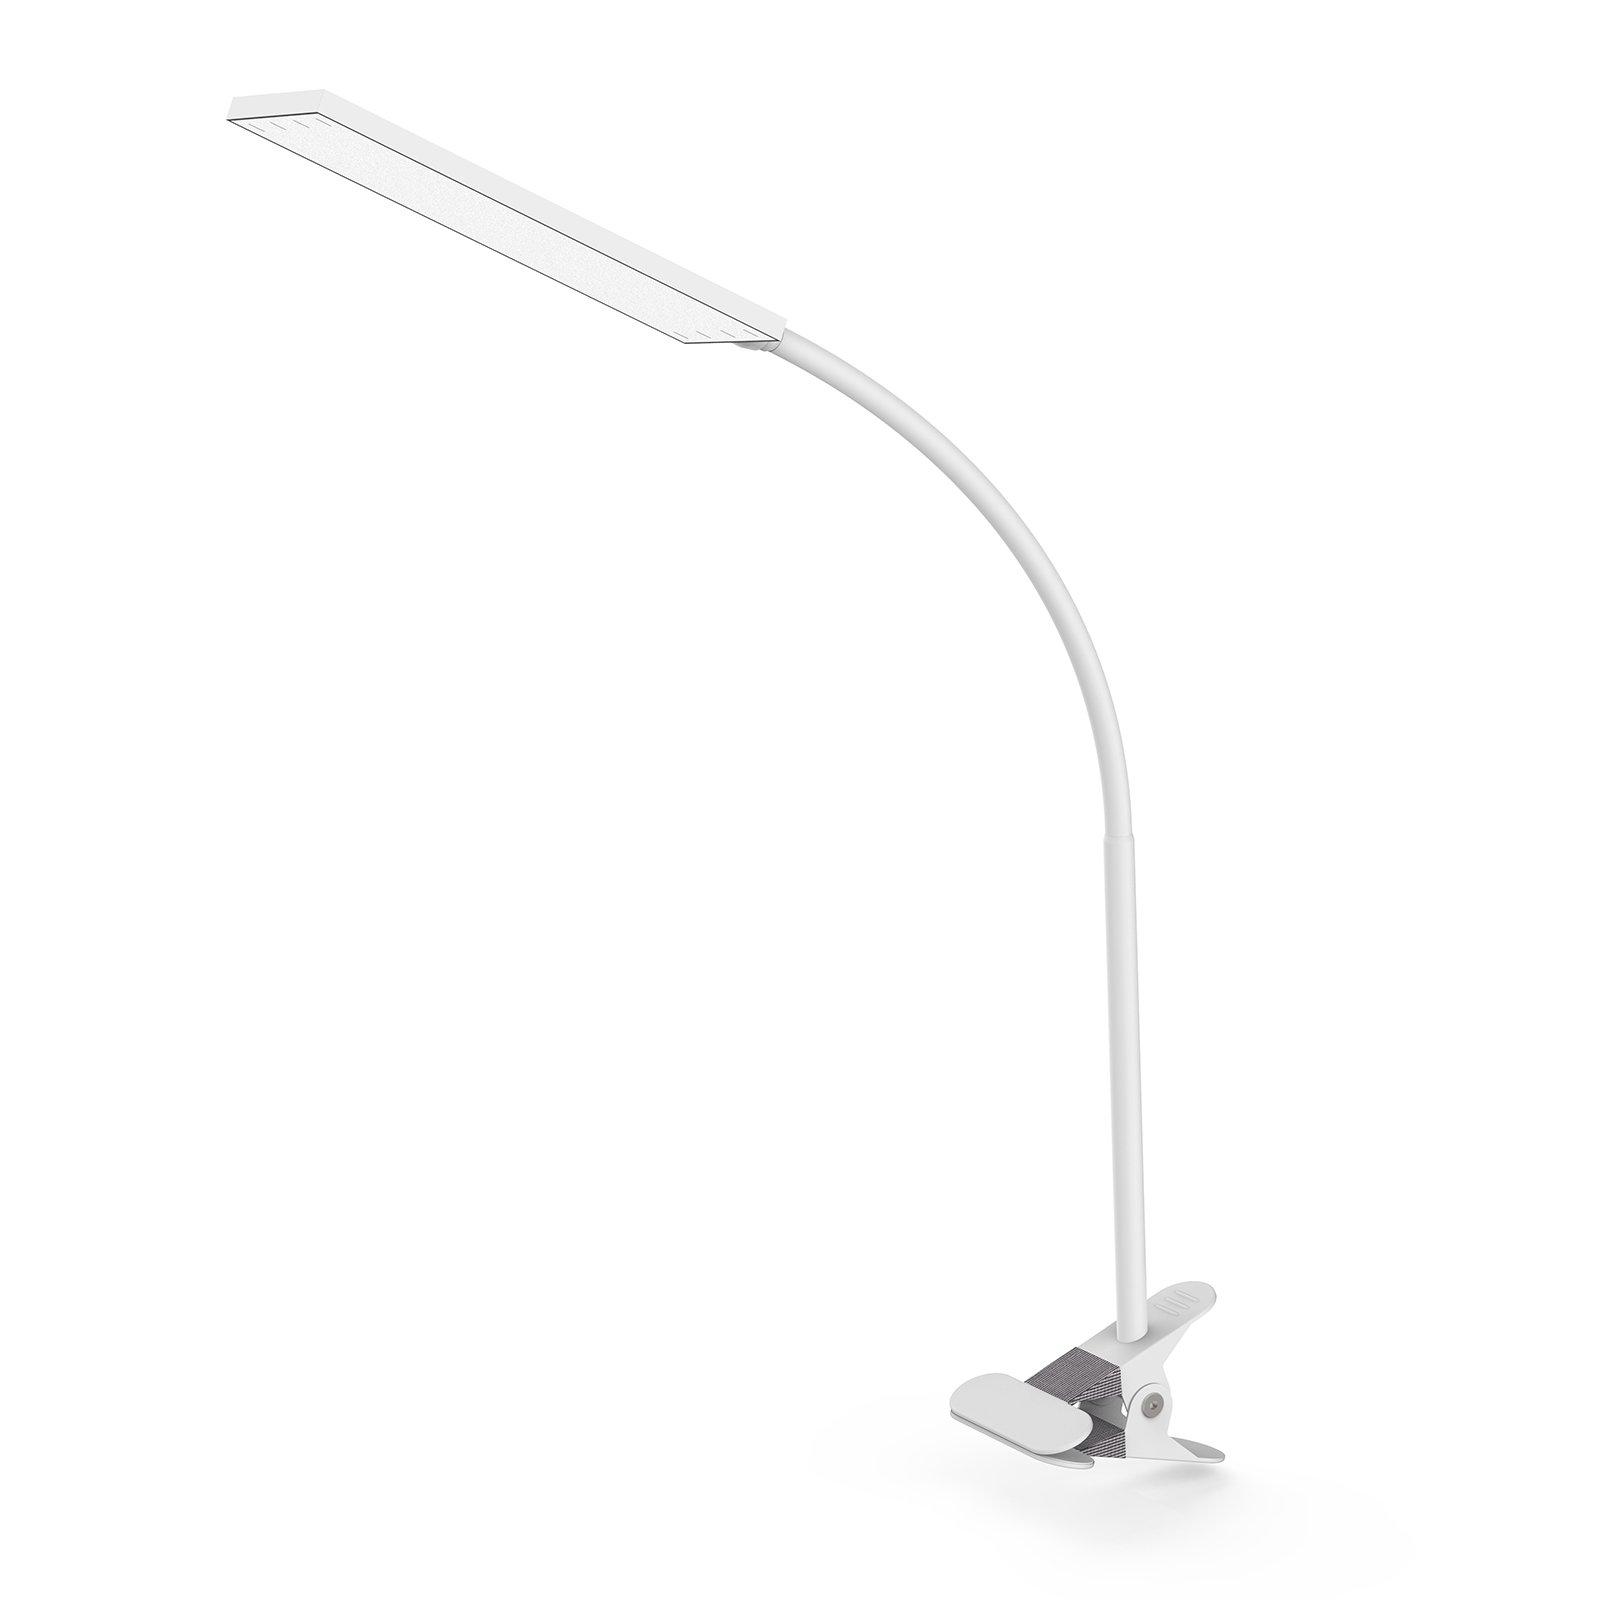 TOPESEL 48 LEDs Desk Lamp, Eye-Care Dimmable Flexible Gooseneck 5W USB Clamp Desk Lamp, 3 Color Temperatures, 14 Brightness Levels Clip Table Light, White